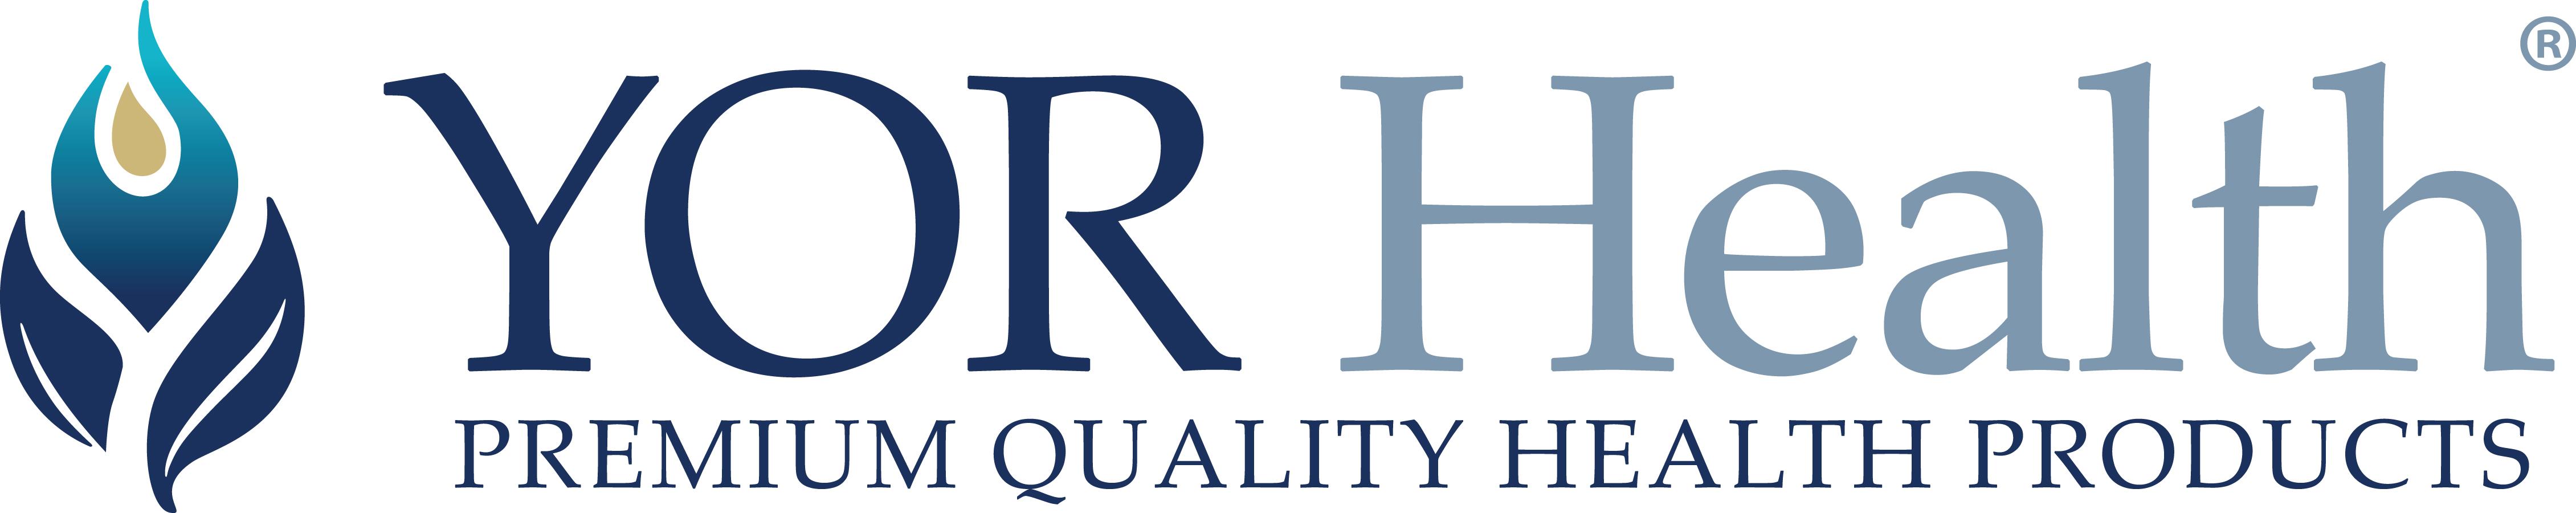 Yor health premium quality logo